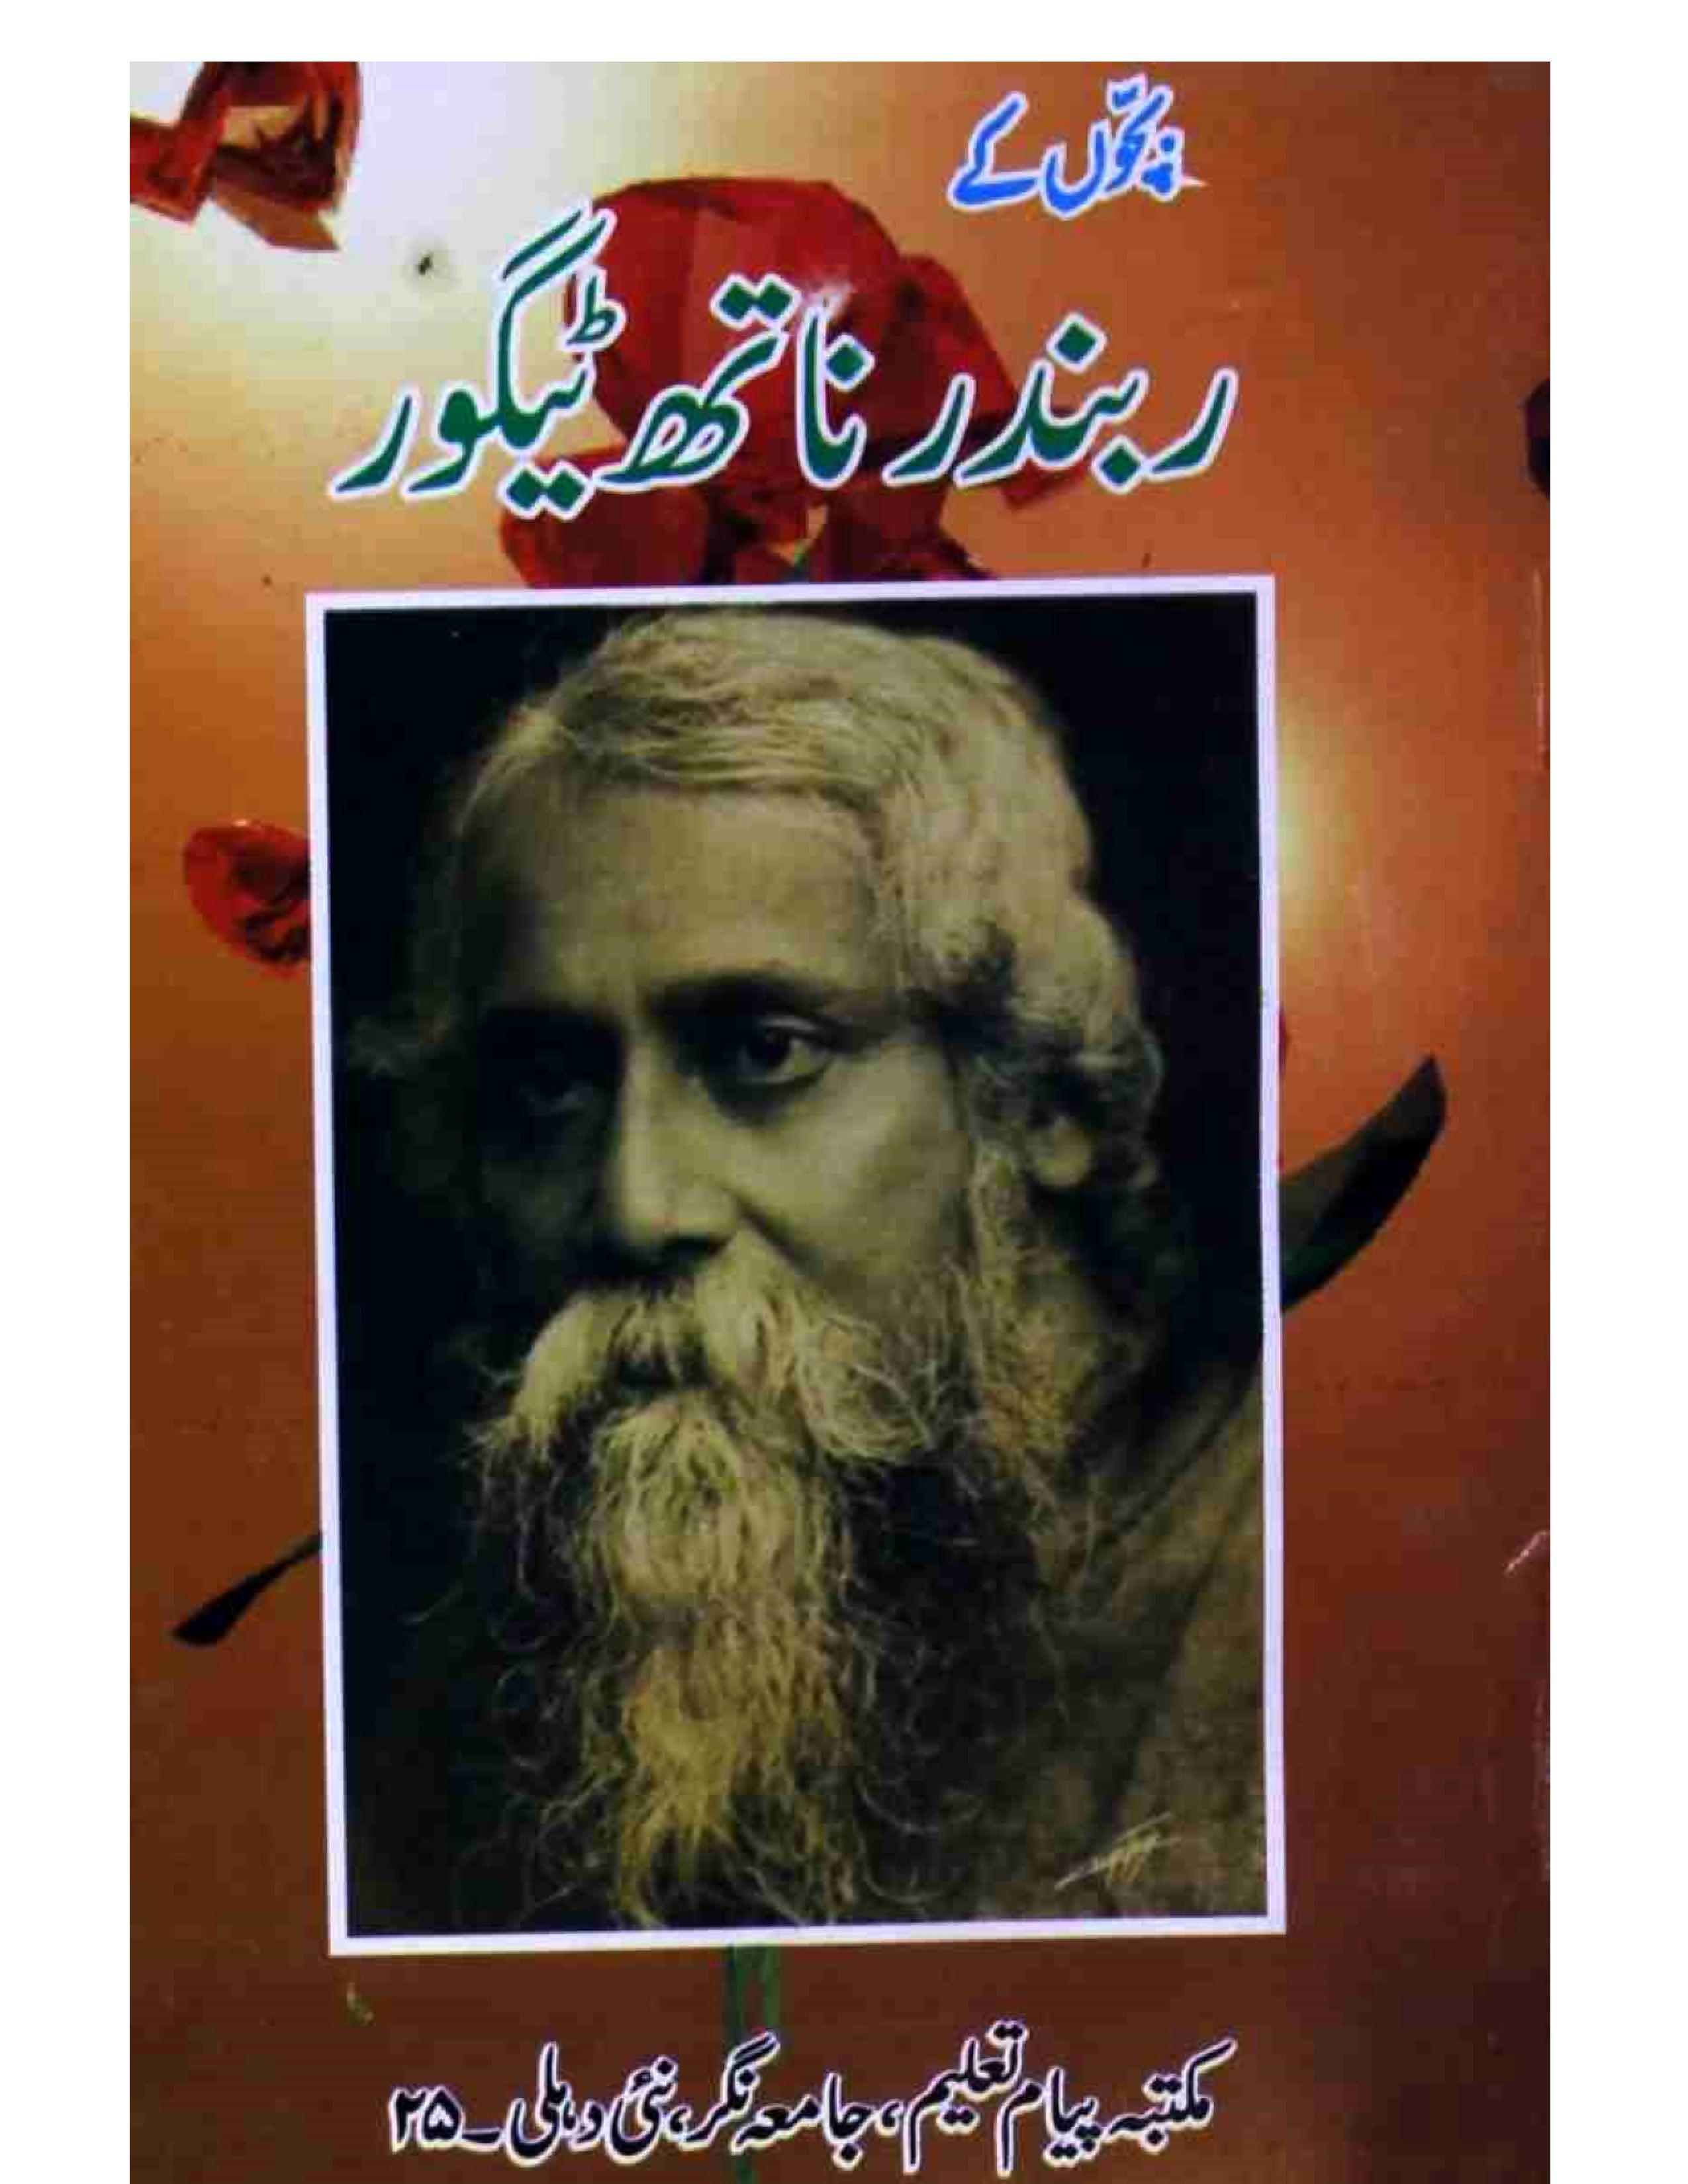 Bachchon Ke Rabindrnath Tagore